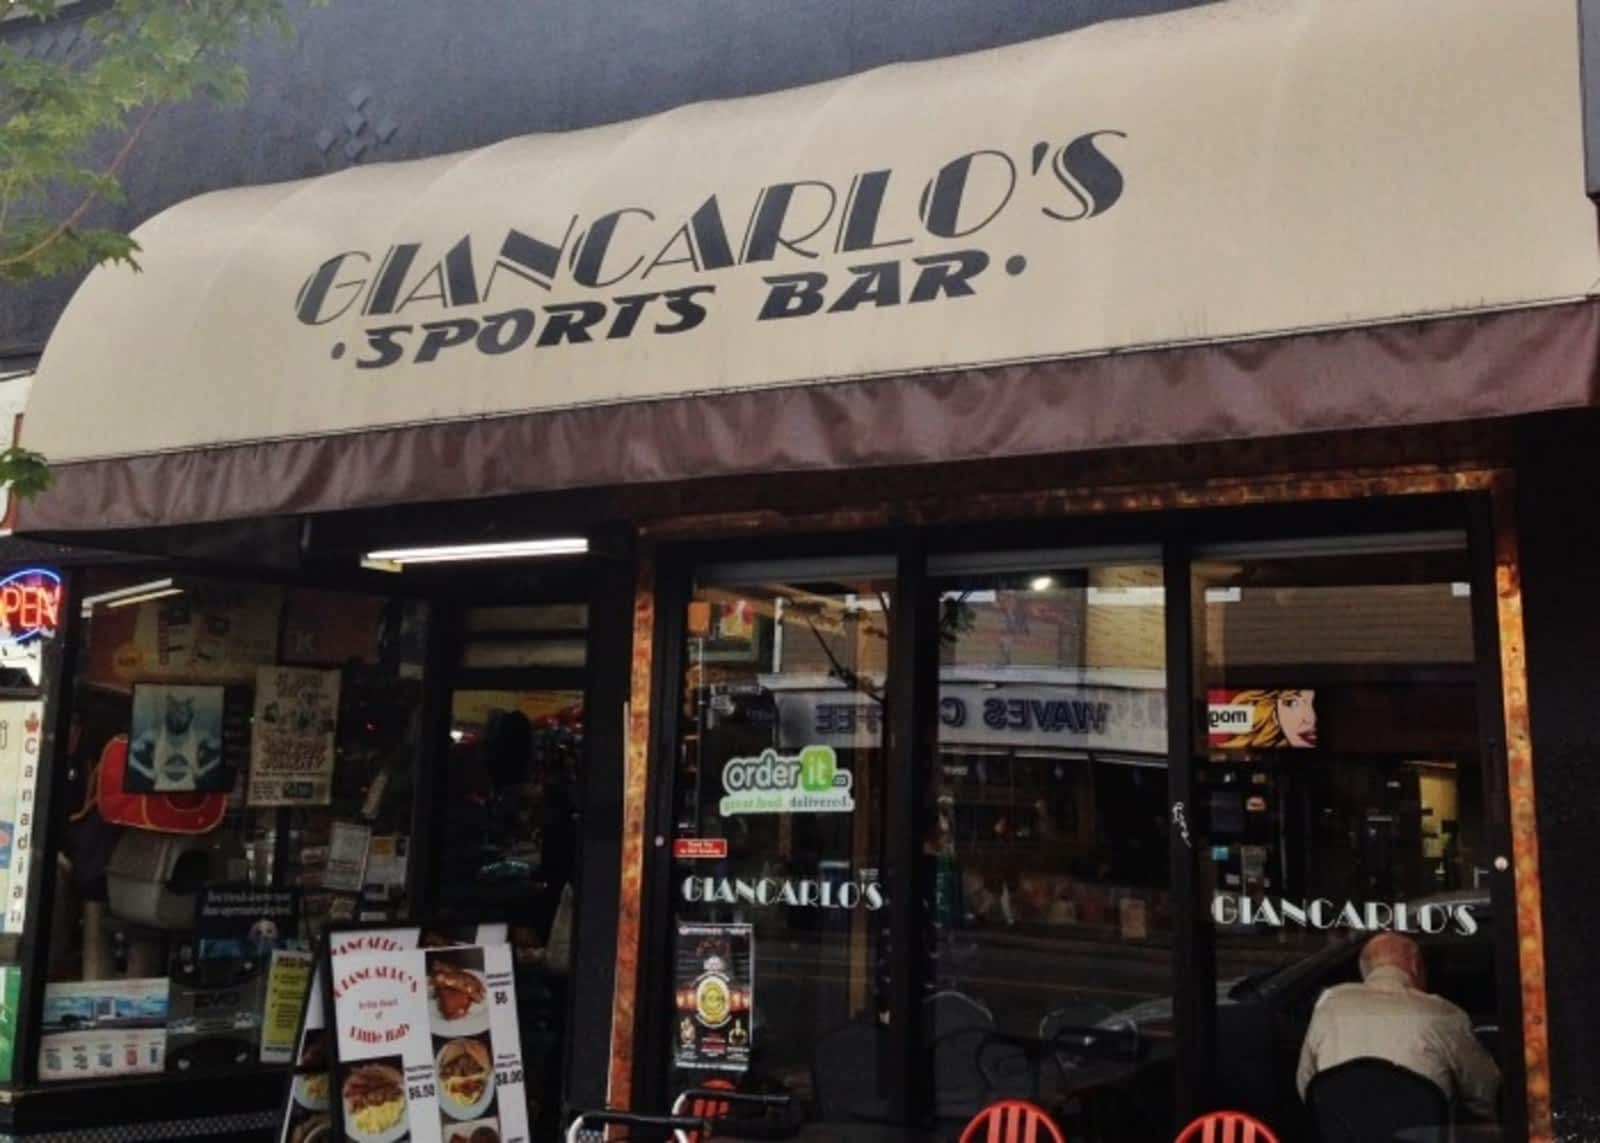 Giancarlo's Sports Bar